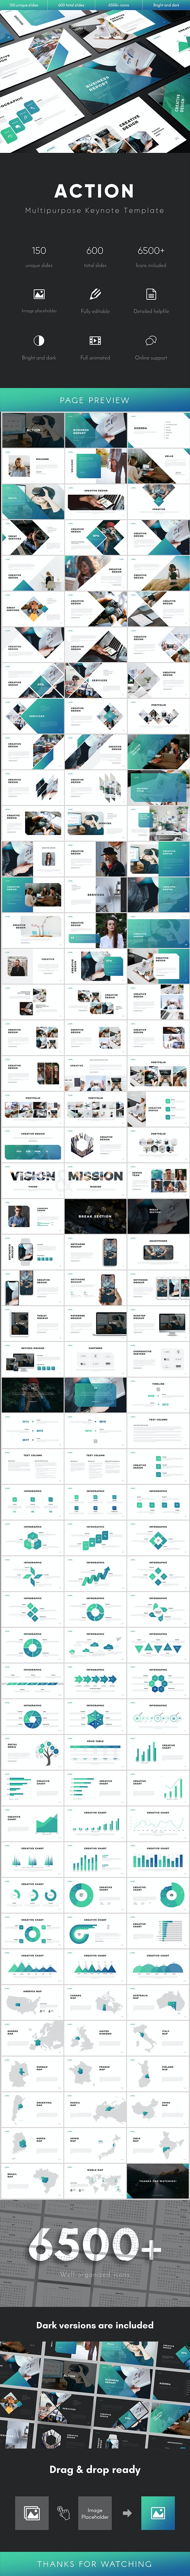 Action Multipurpose Keynote Template - Business Keynote Templates